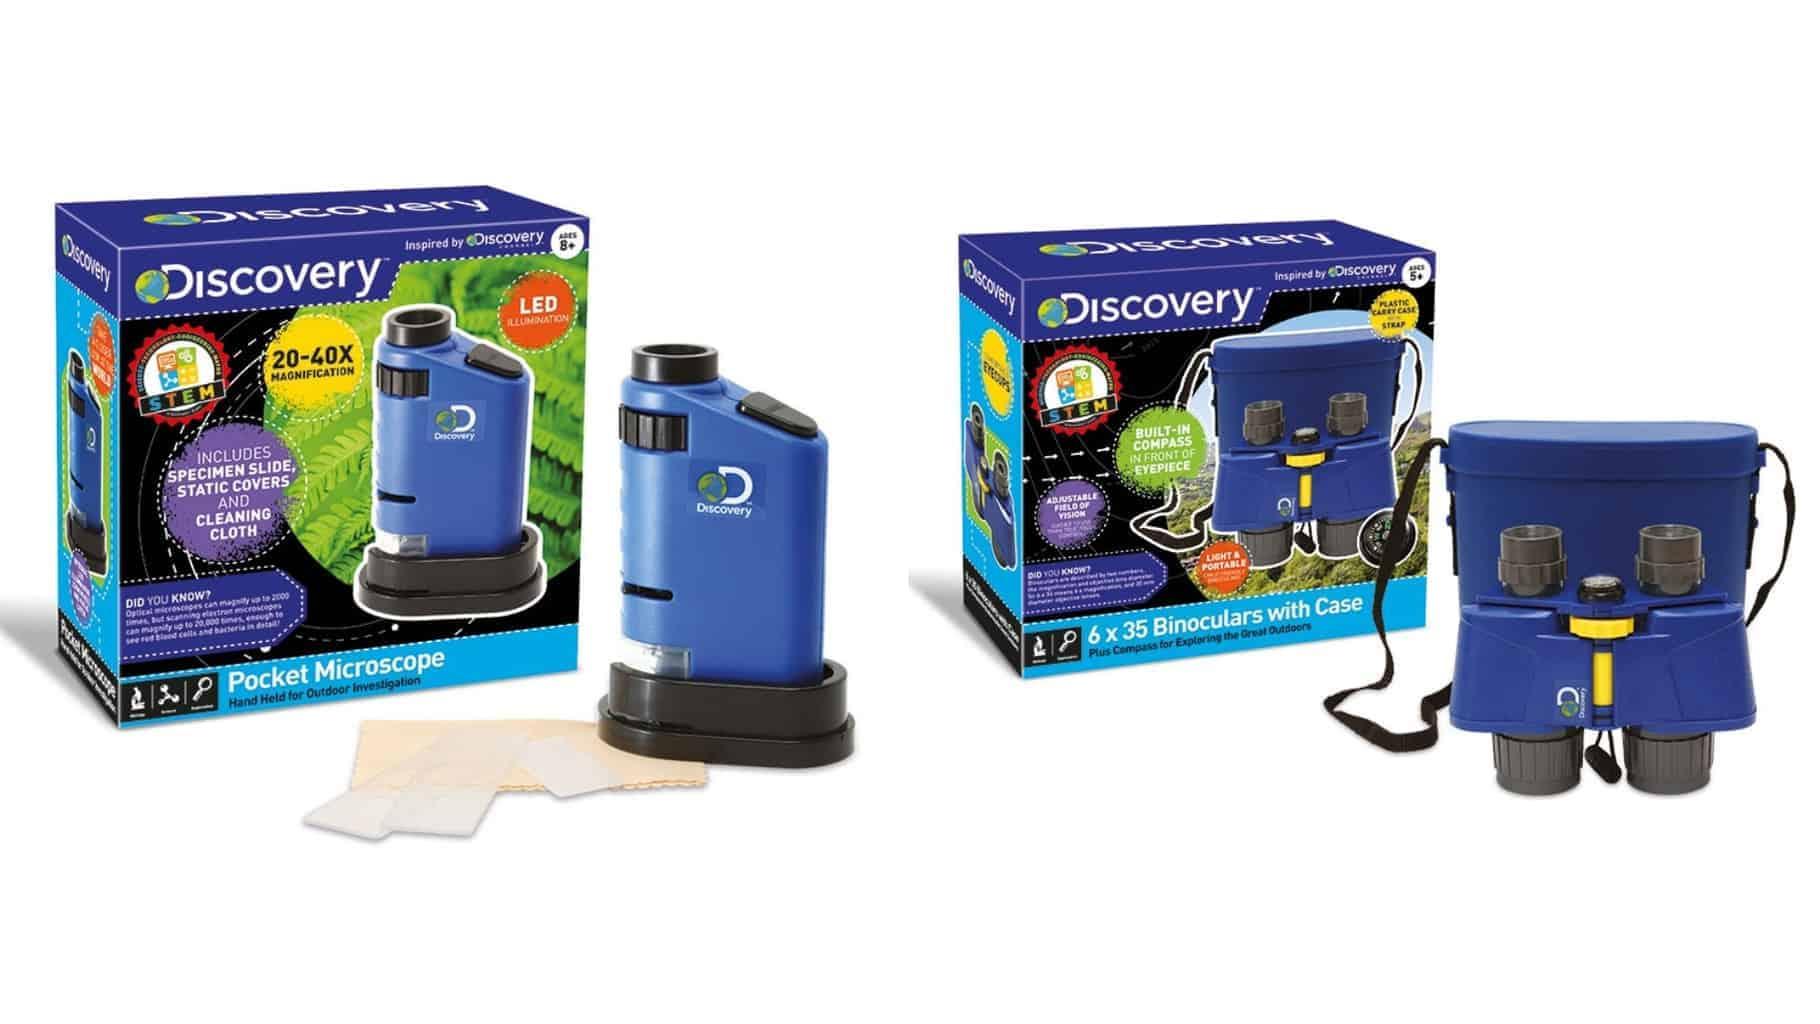 Discovery Pocket Microscope and Binoculars